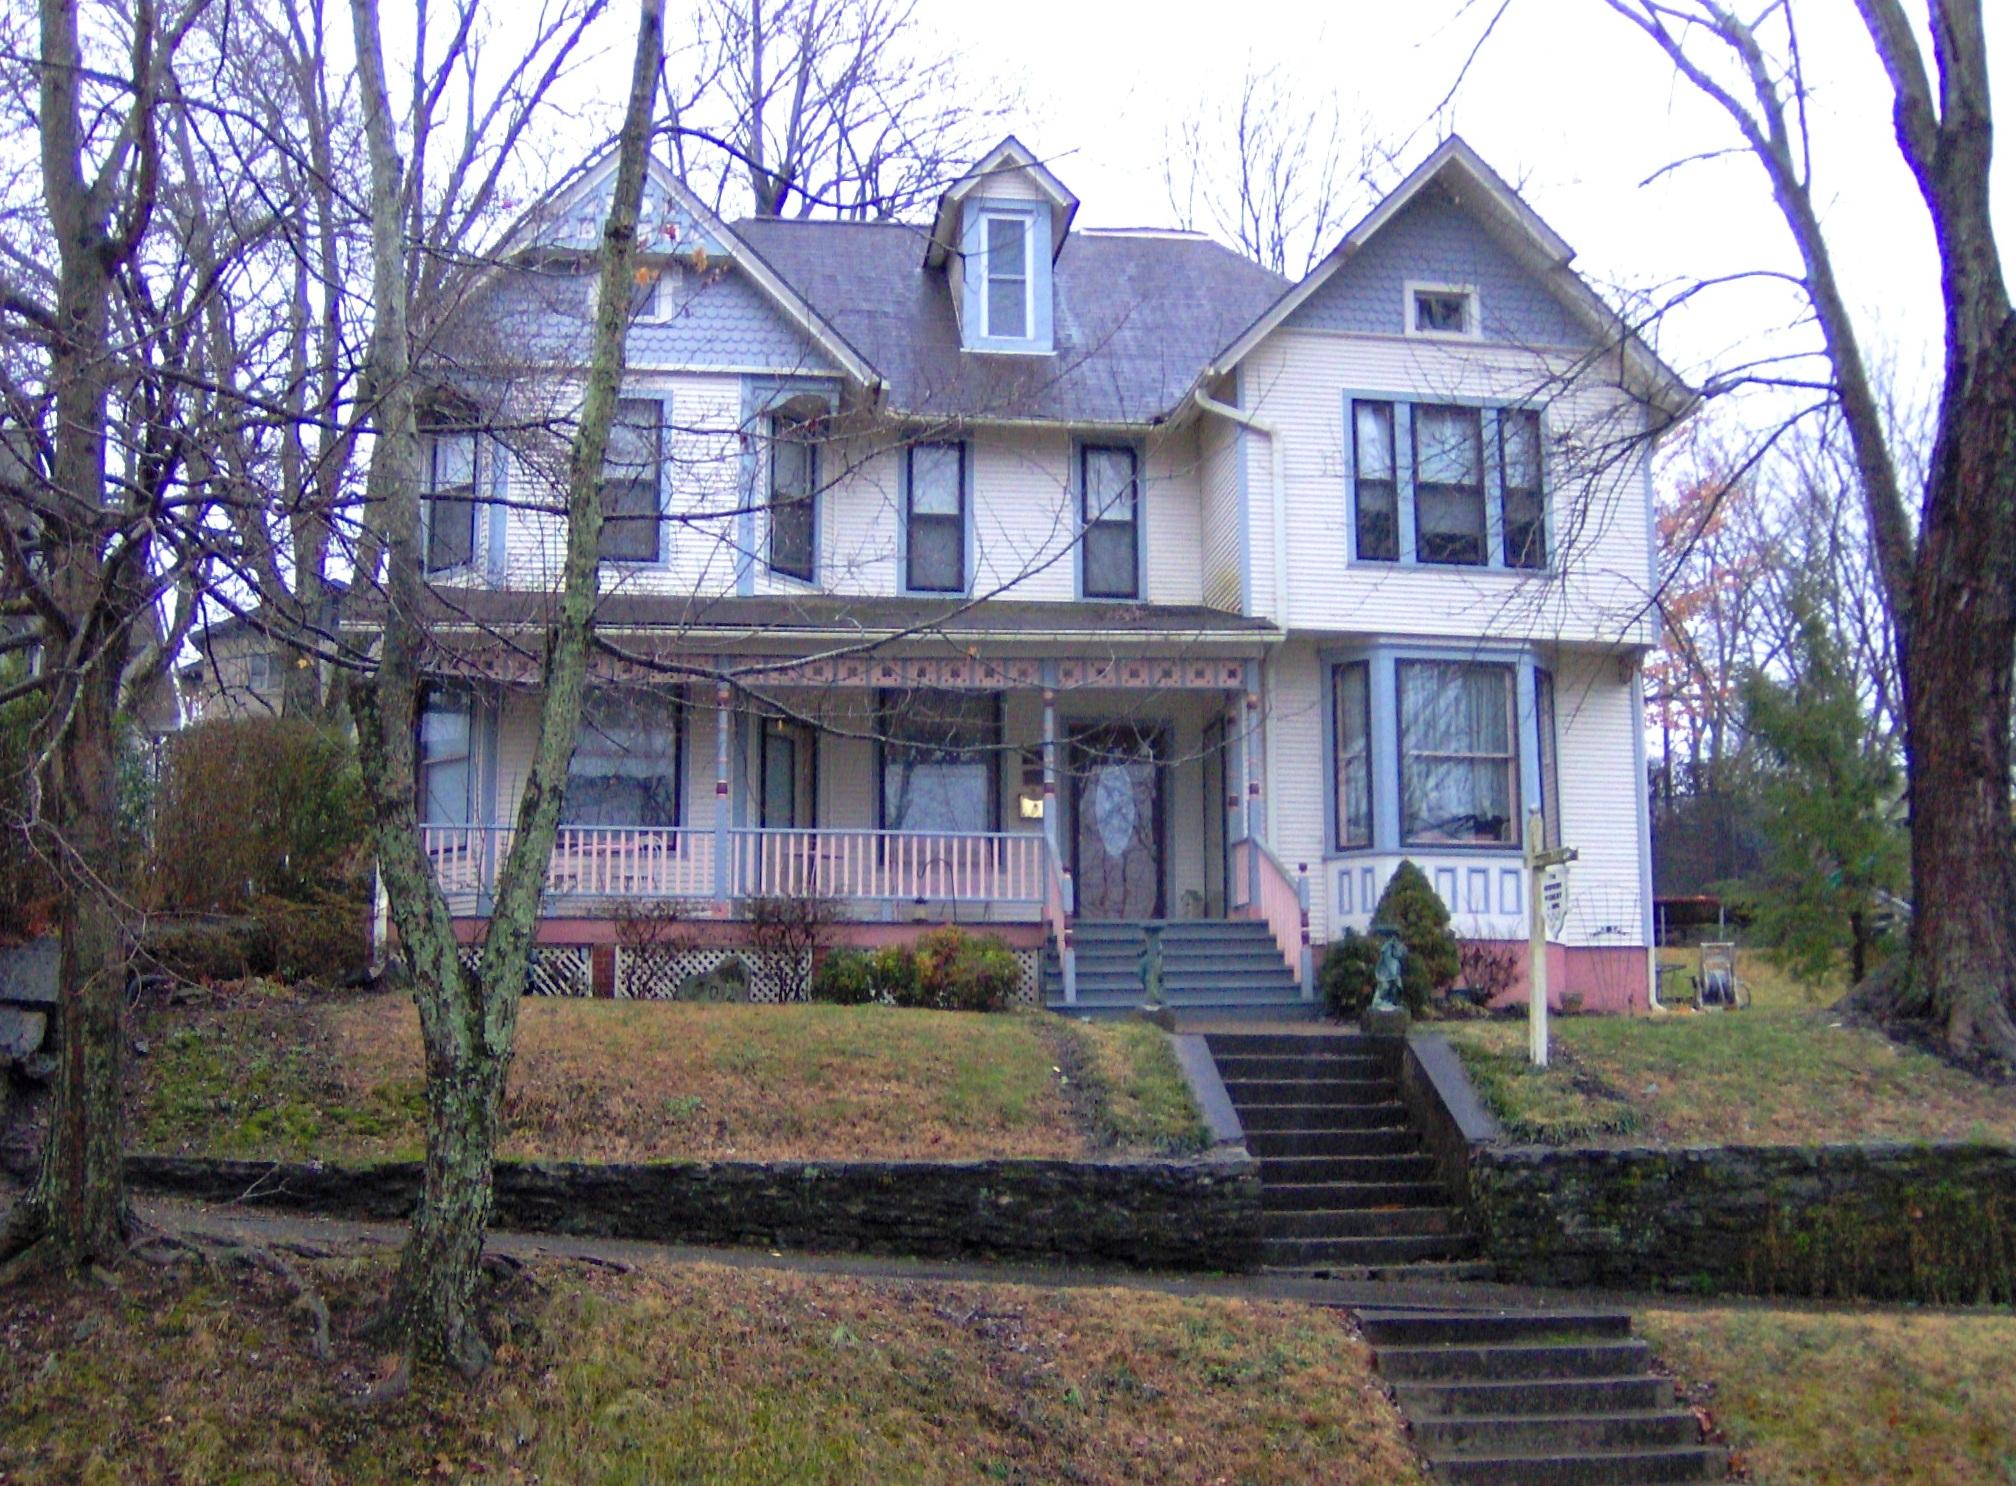 File Stevens Whaley House Tn1 Jpg Wikimedia Commons